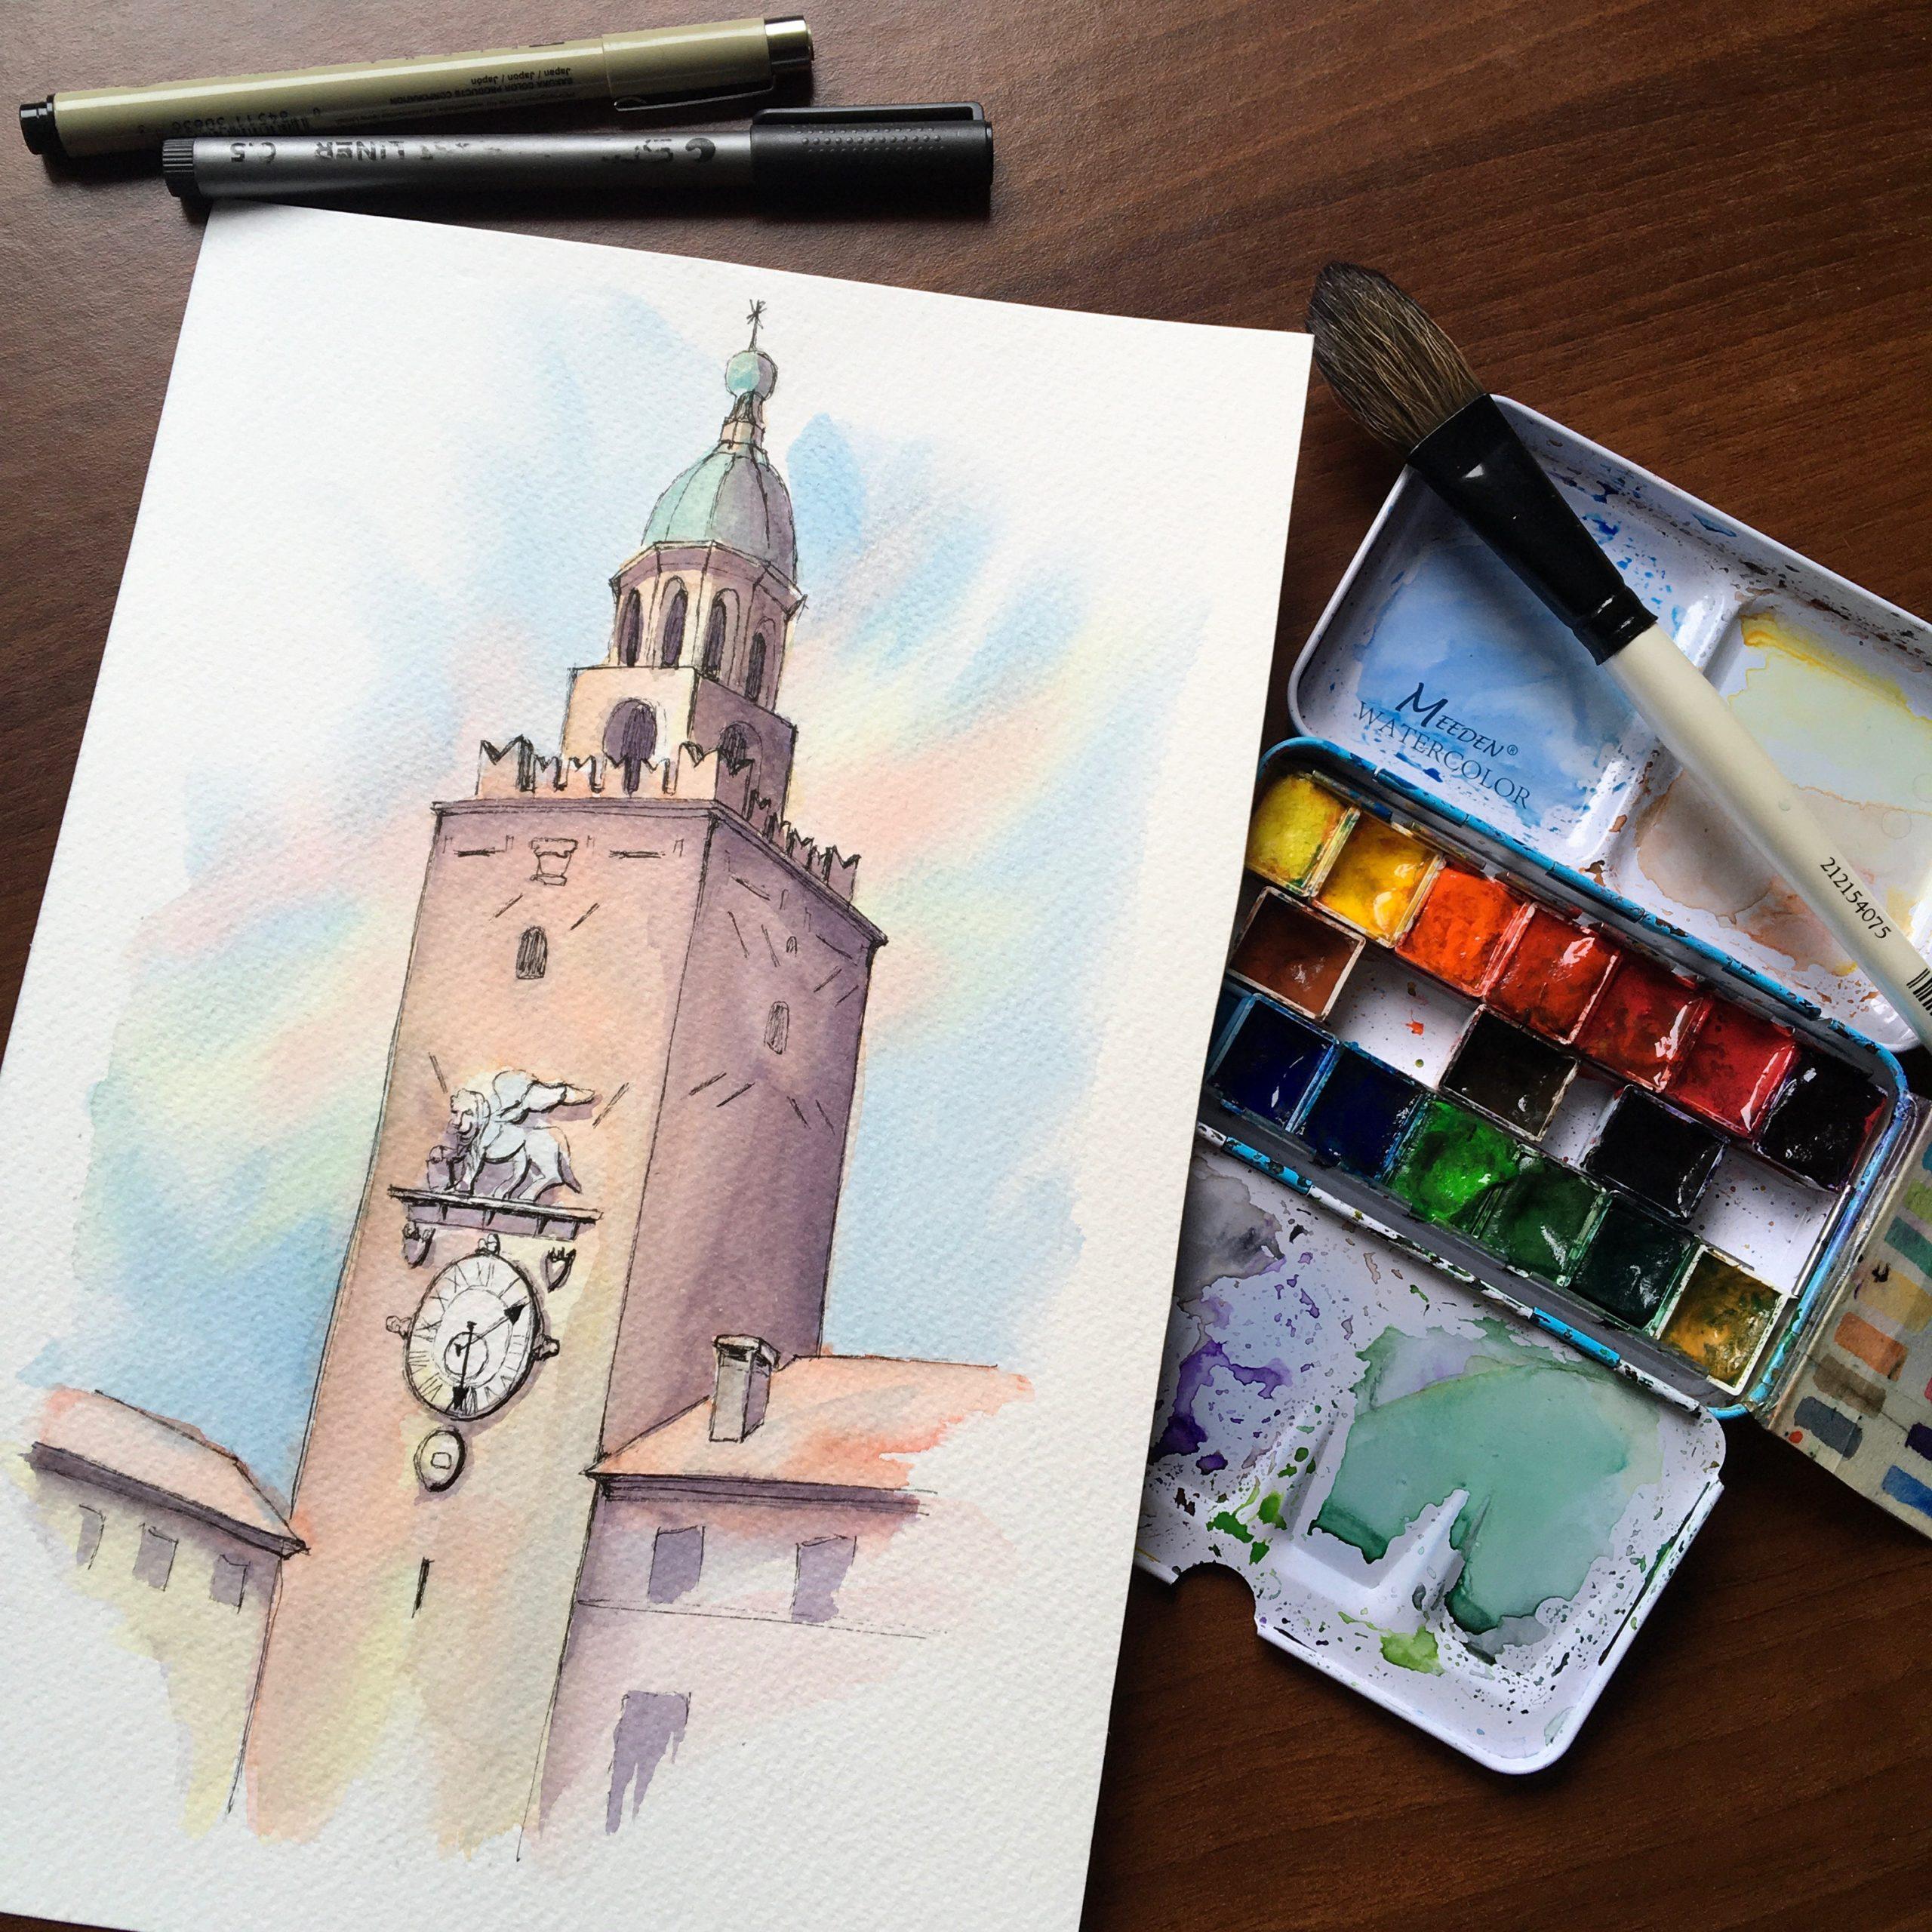 Castle Tower at Castelfranco Veneto